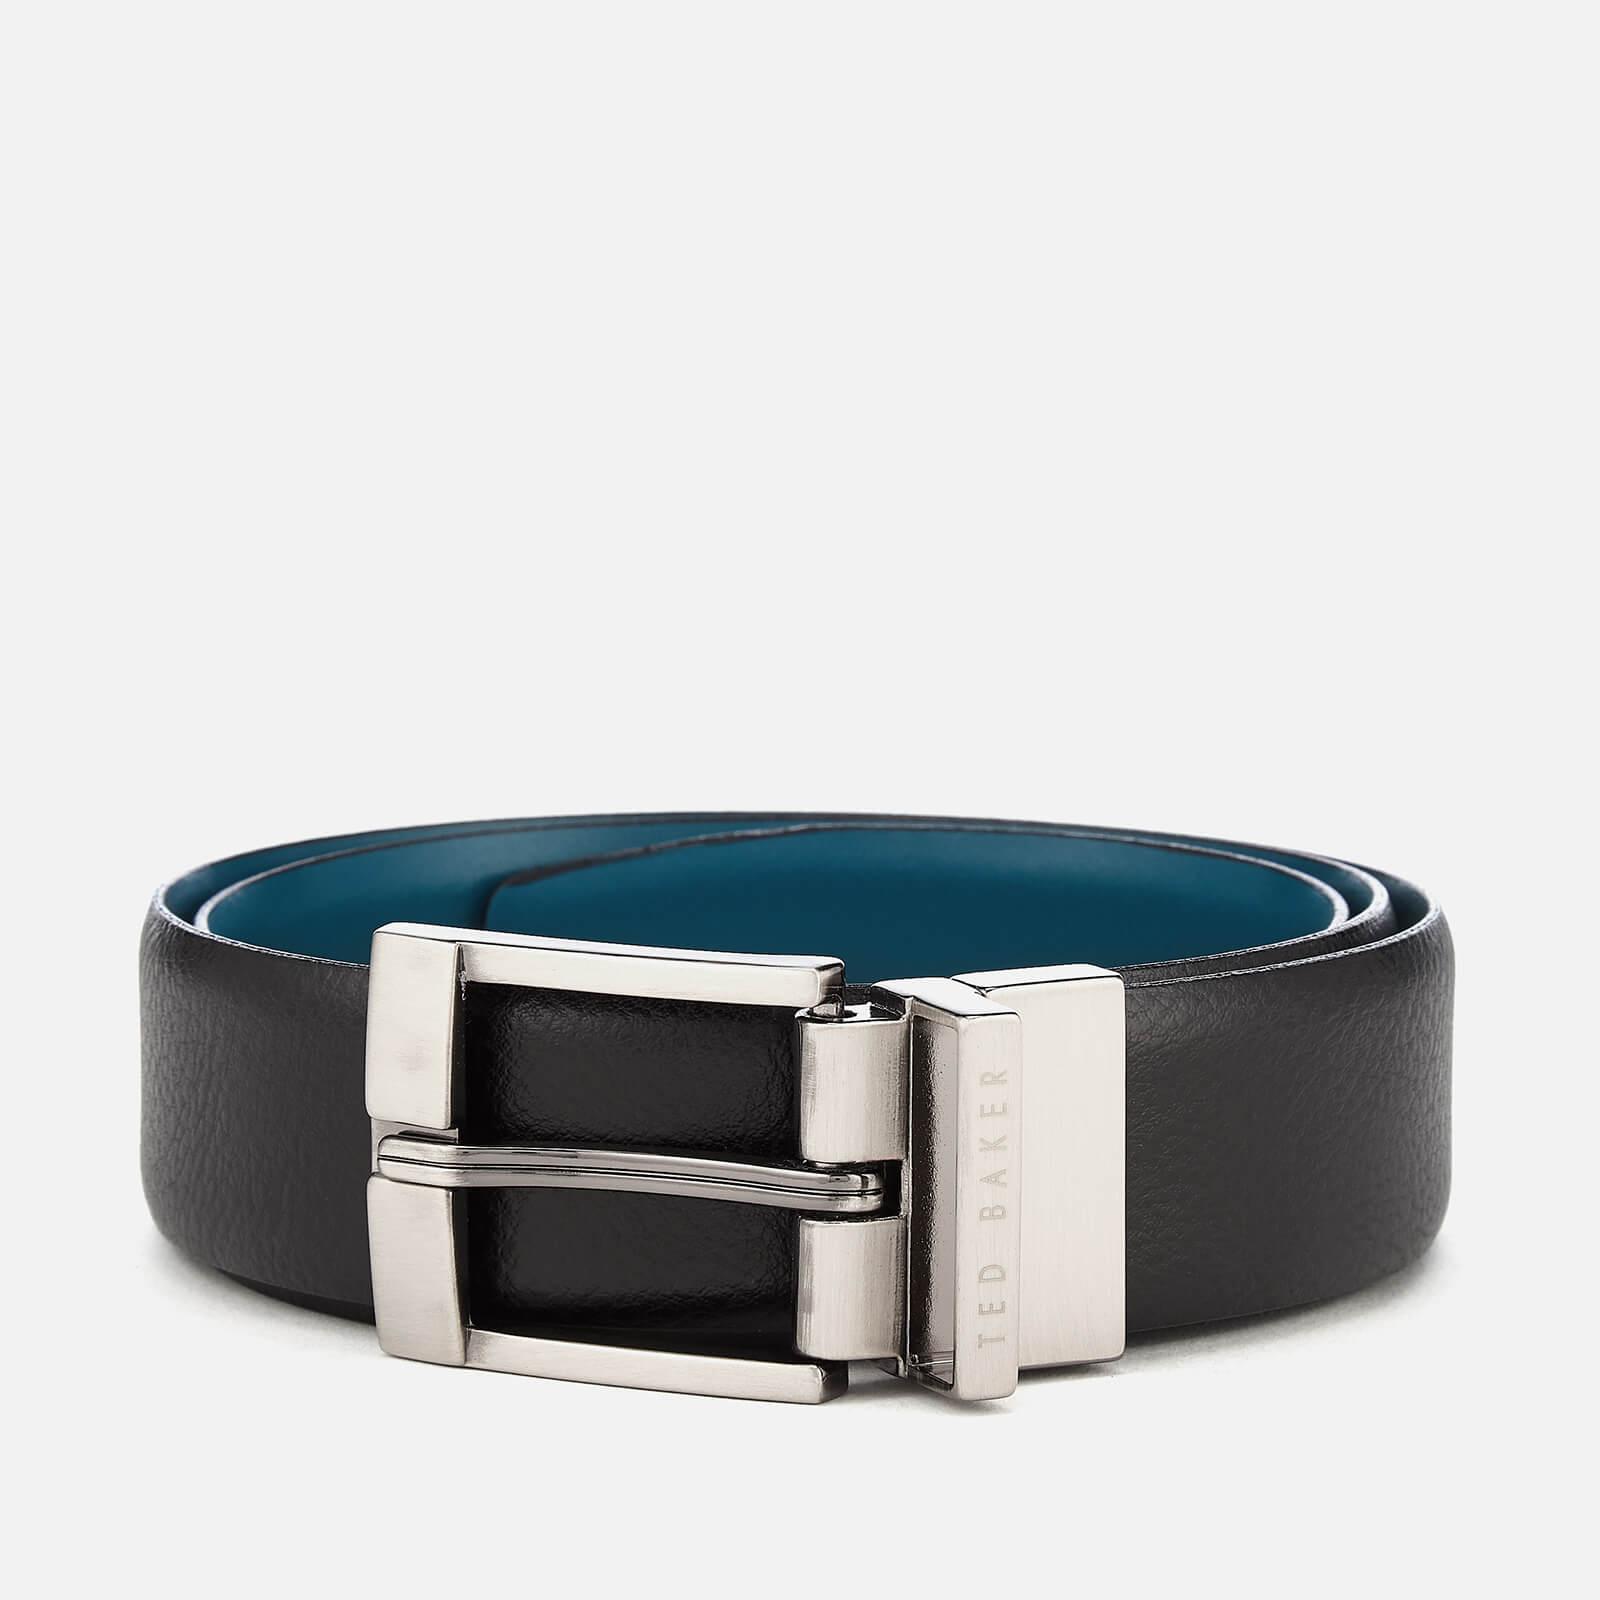 b8846e301 Ted Baker Men s Longas Leather Belt - Black Mens Accessories ...